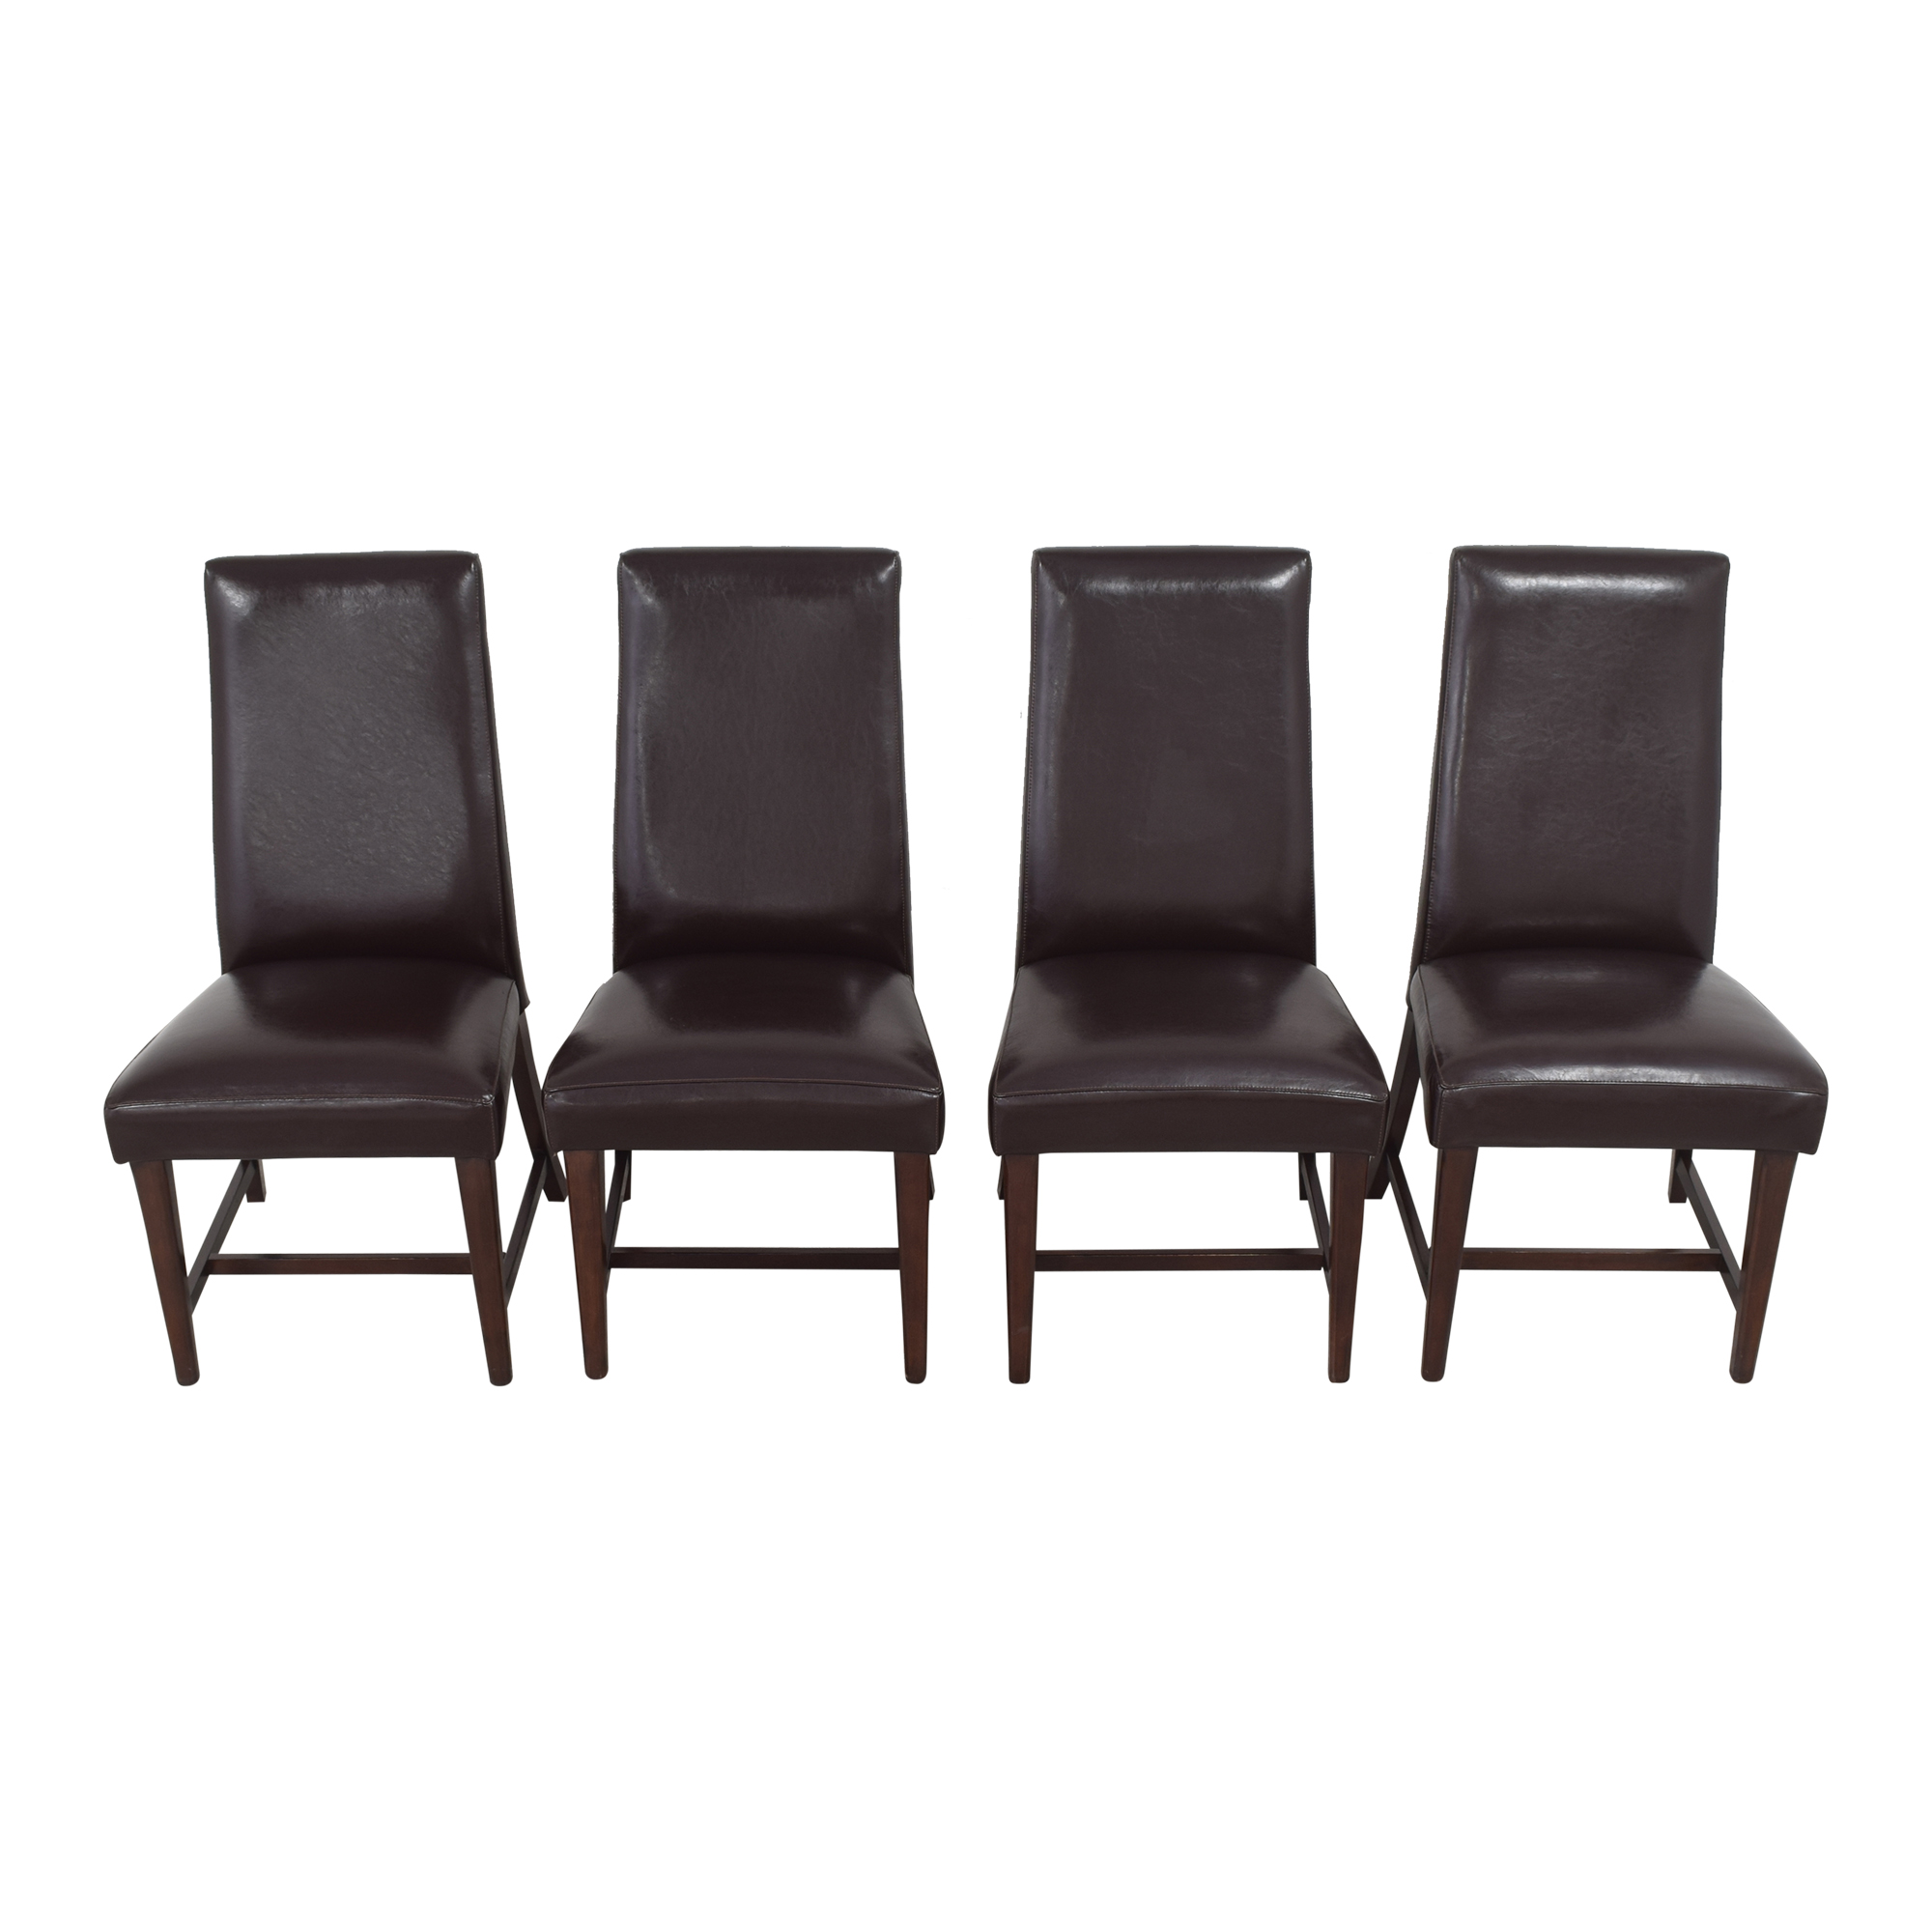 Shermag Shermag High Back Dining Chairs nj